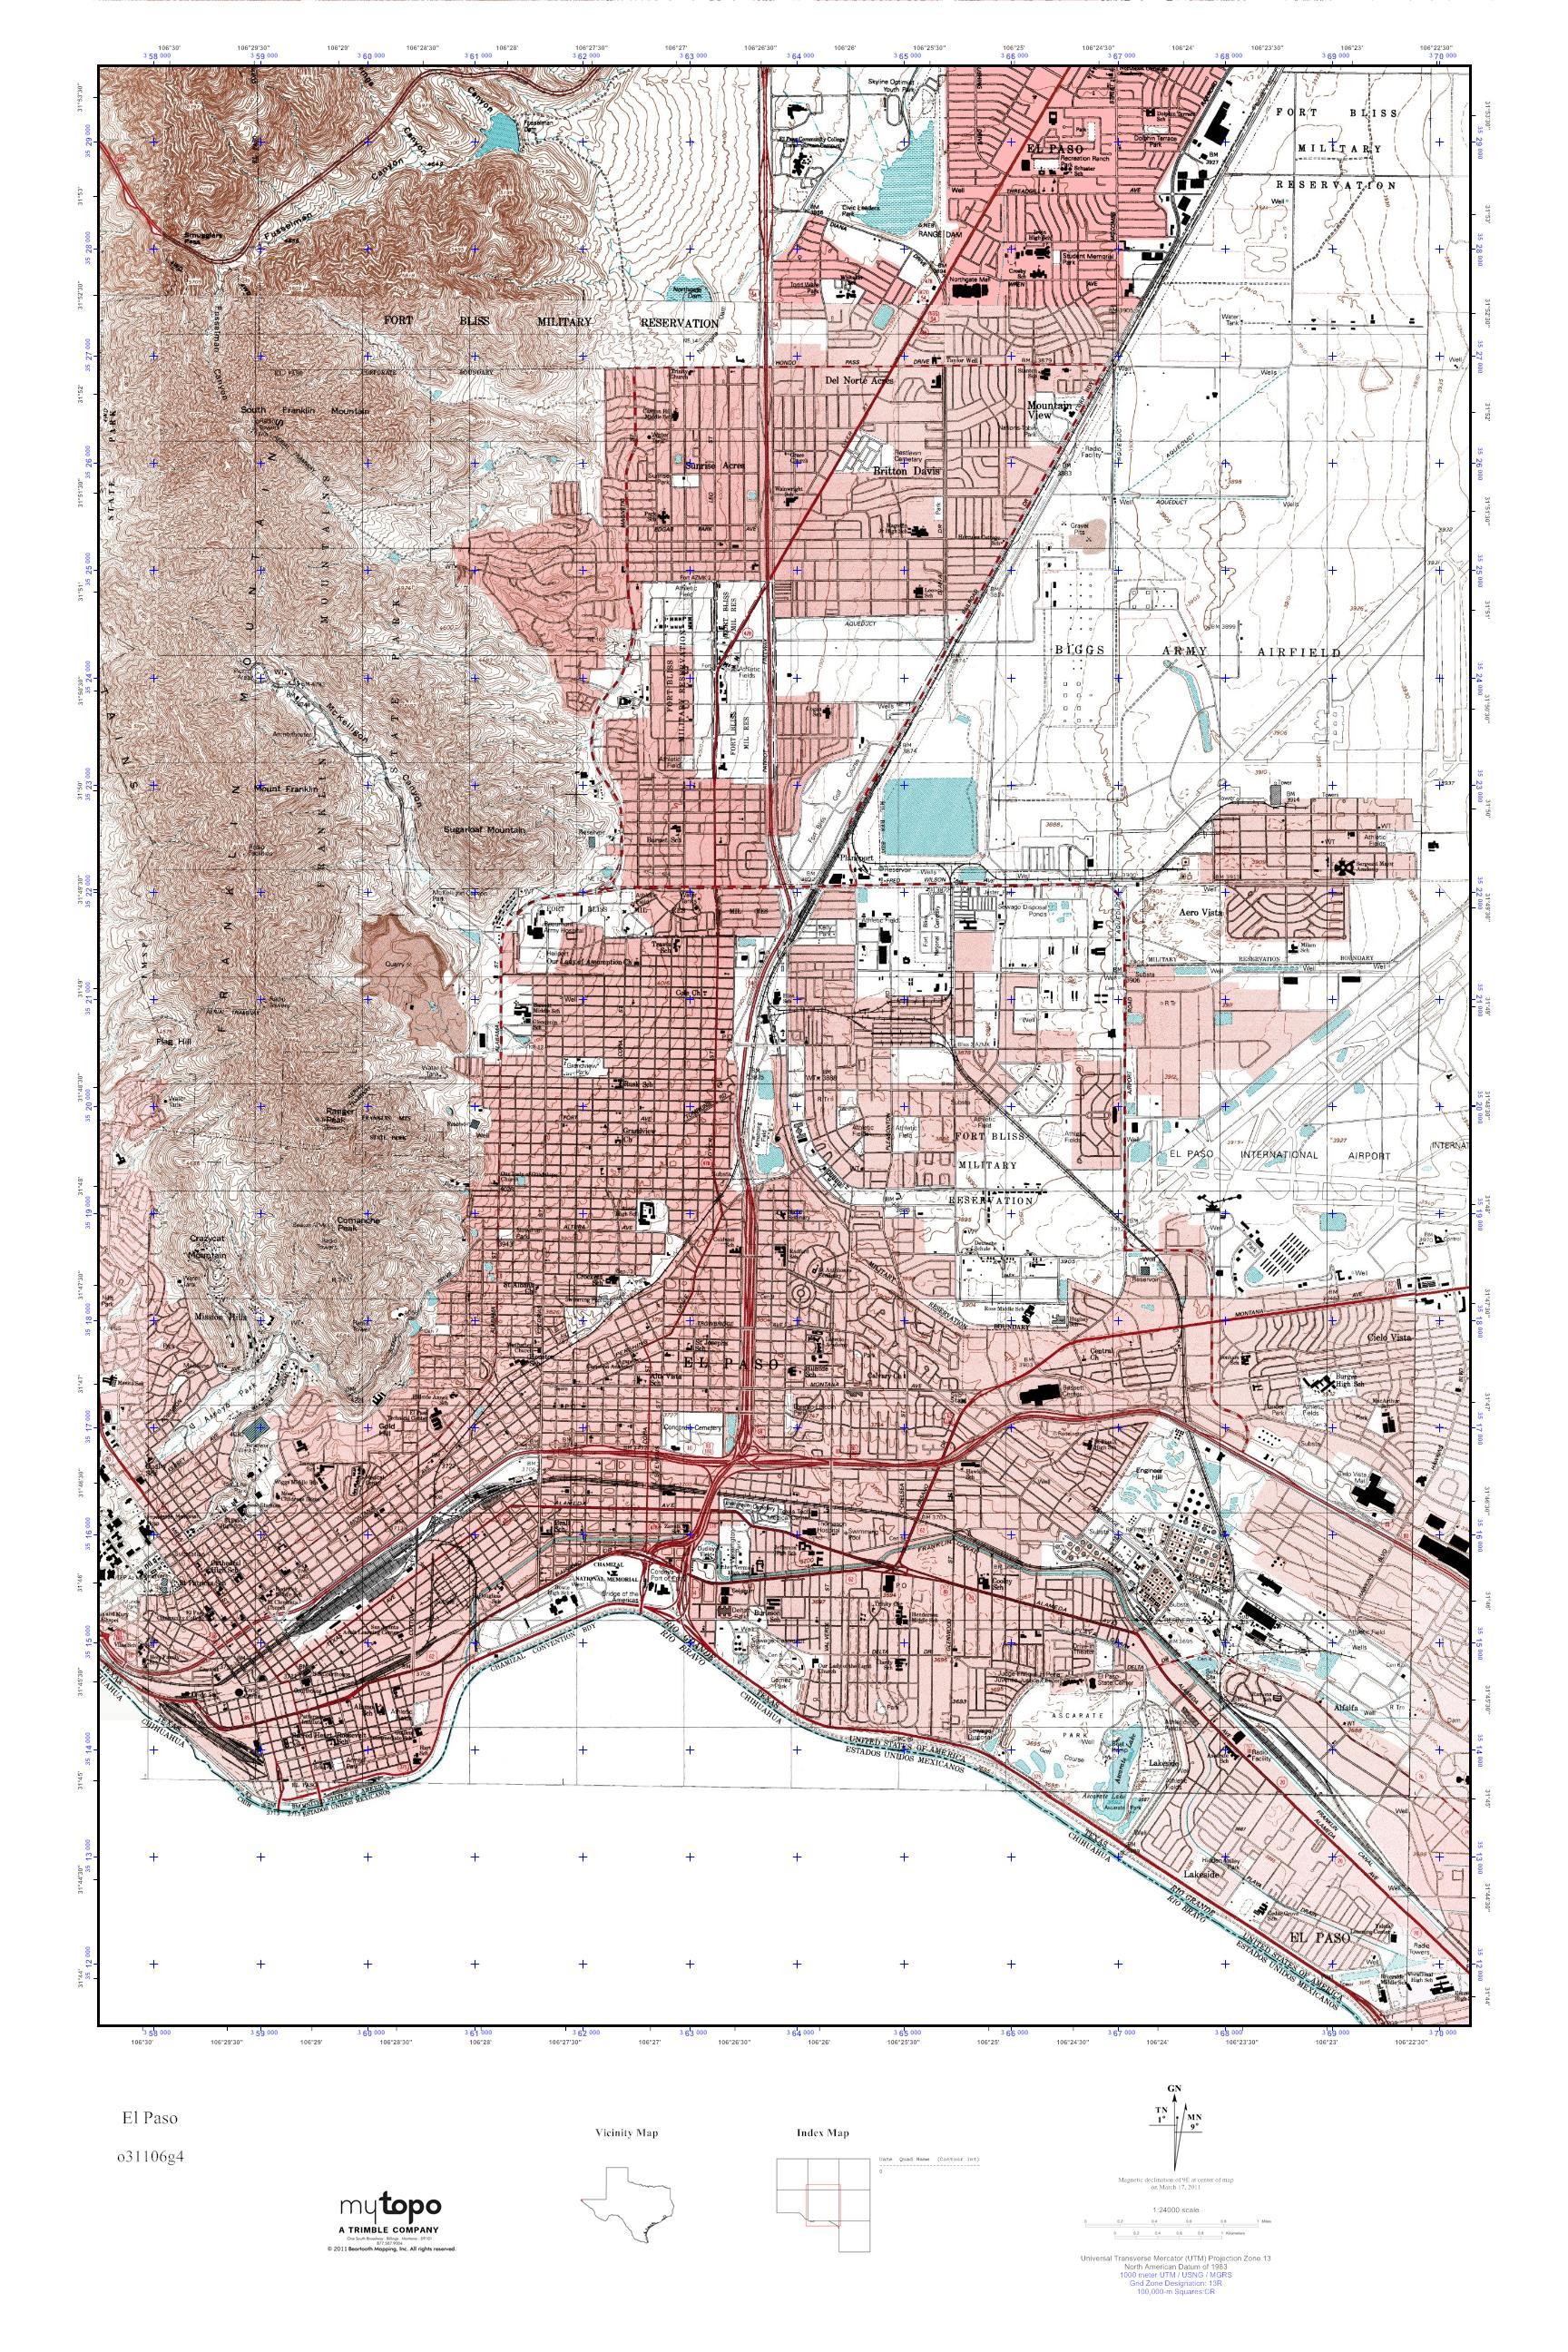 MyTopo El Paso Texas USGS Quad Topo Map